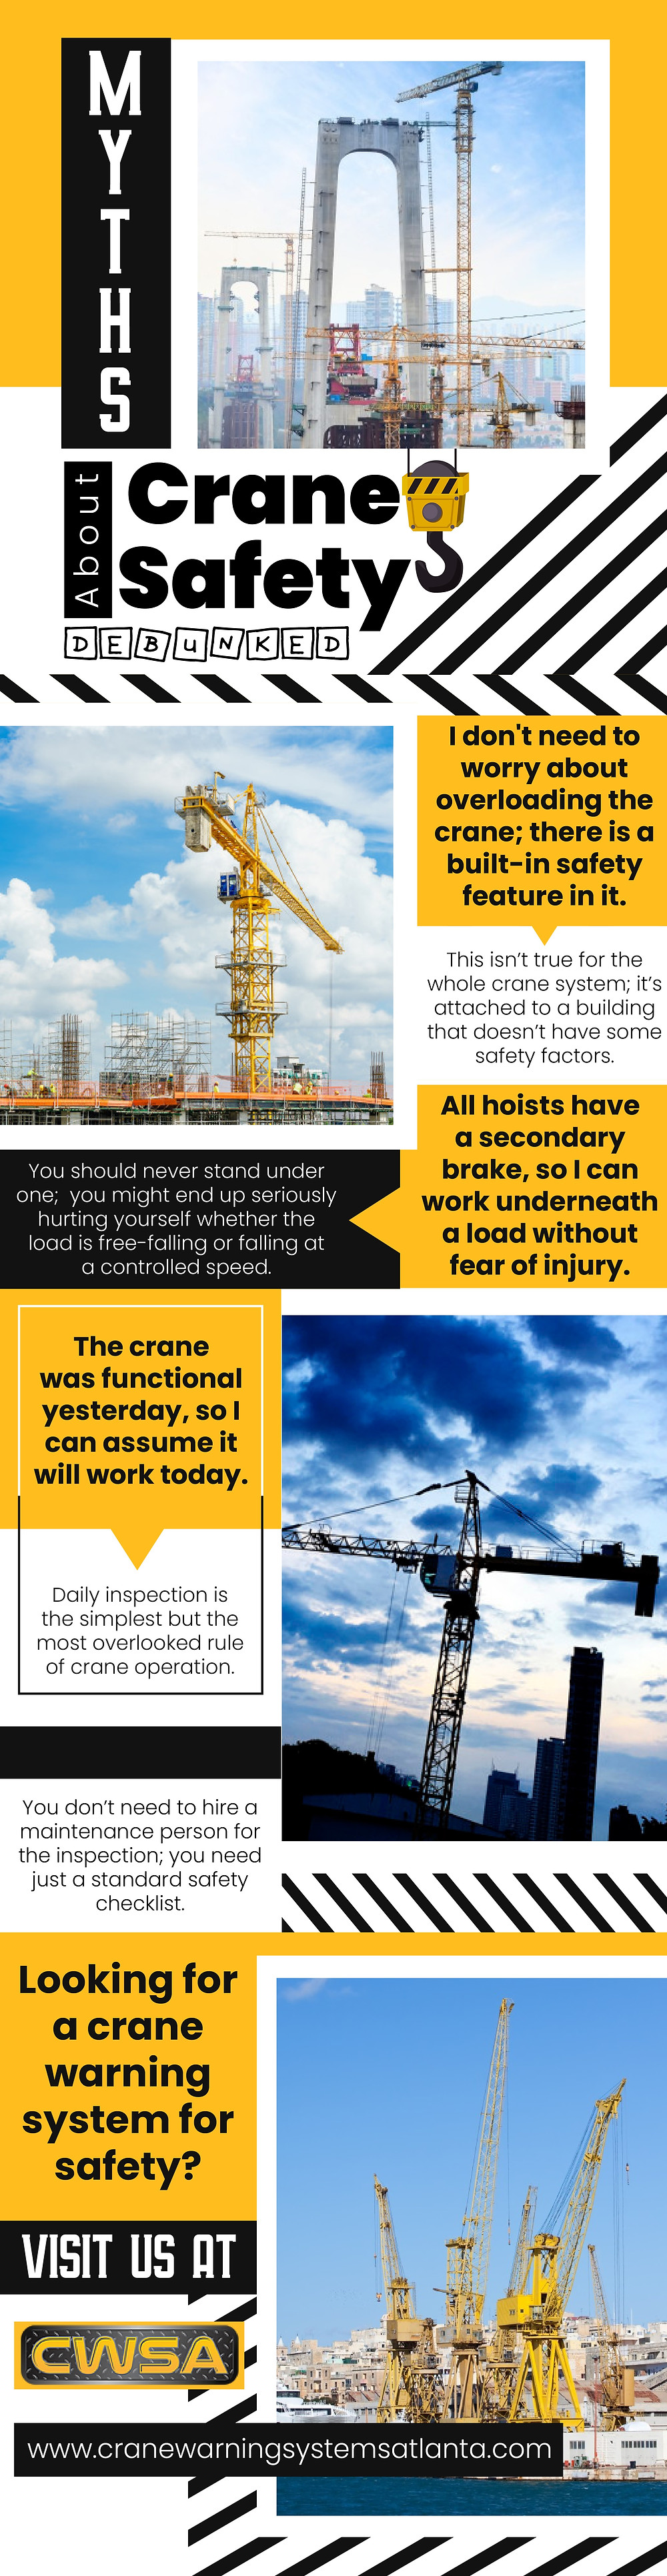 Myths About Crane Safety Debunked